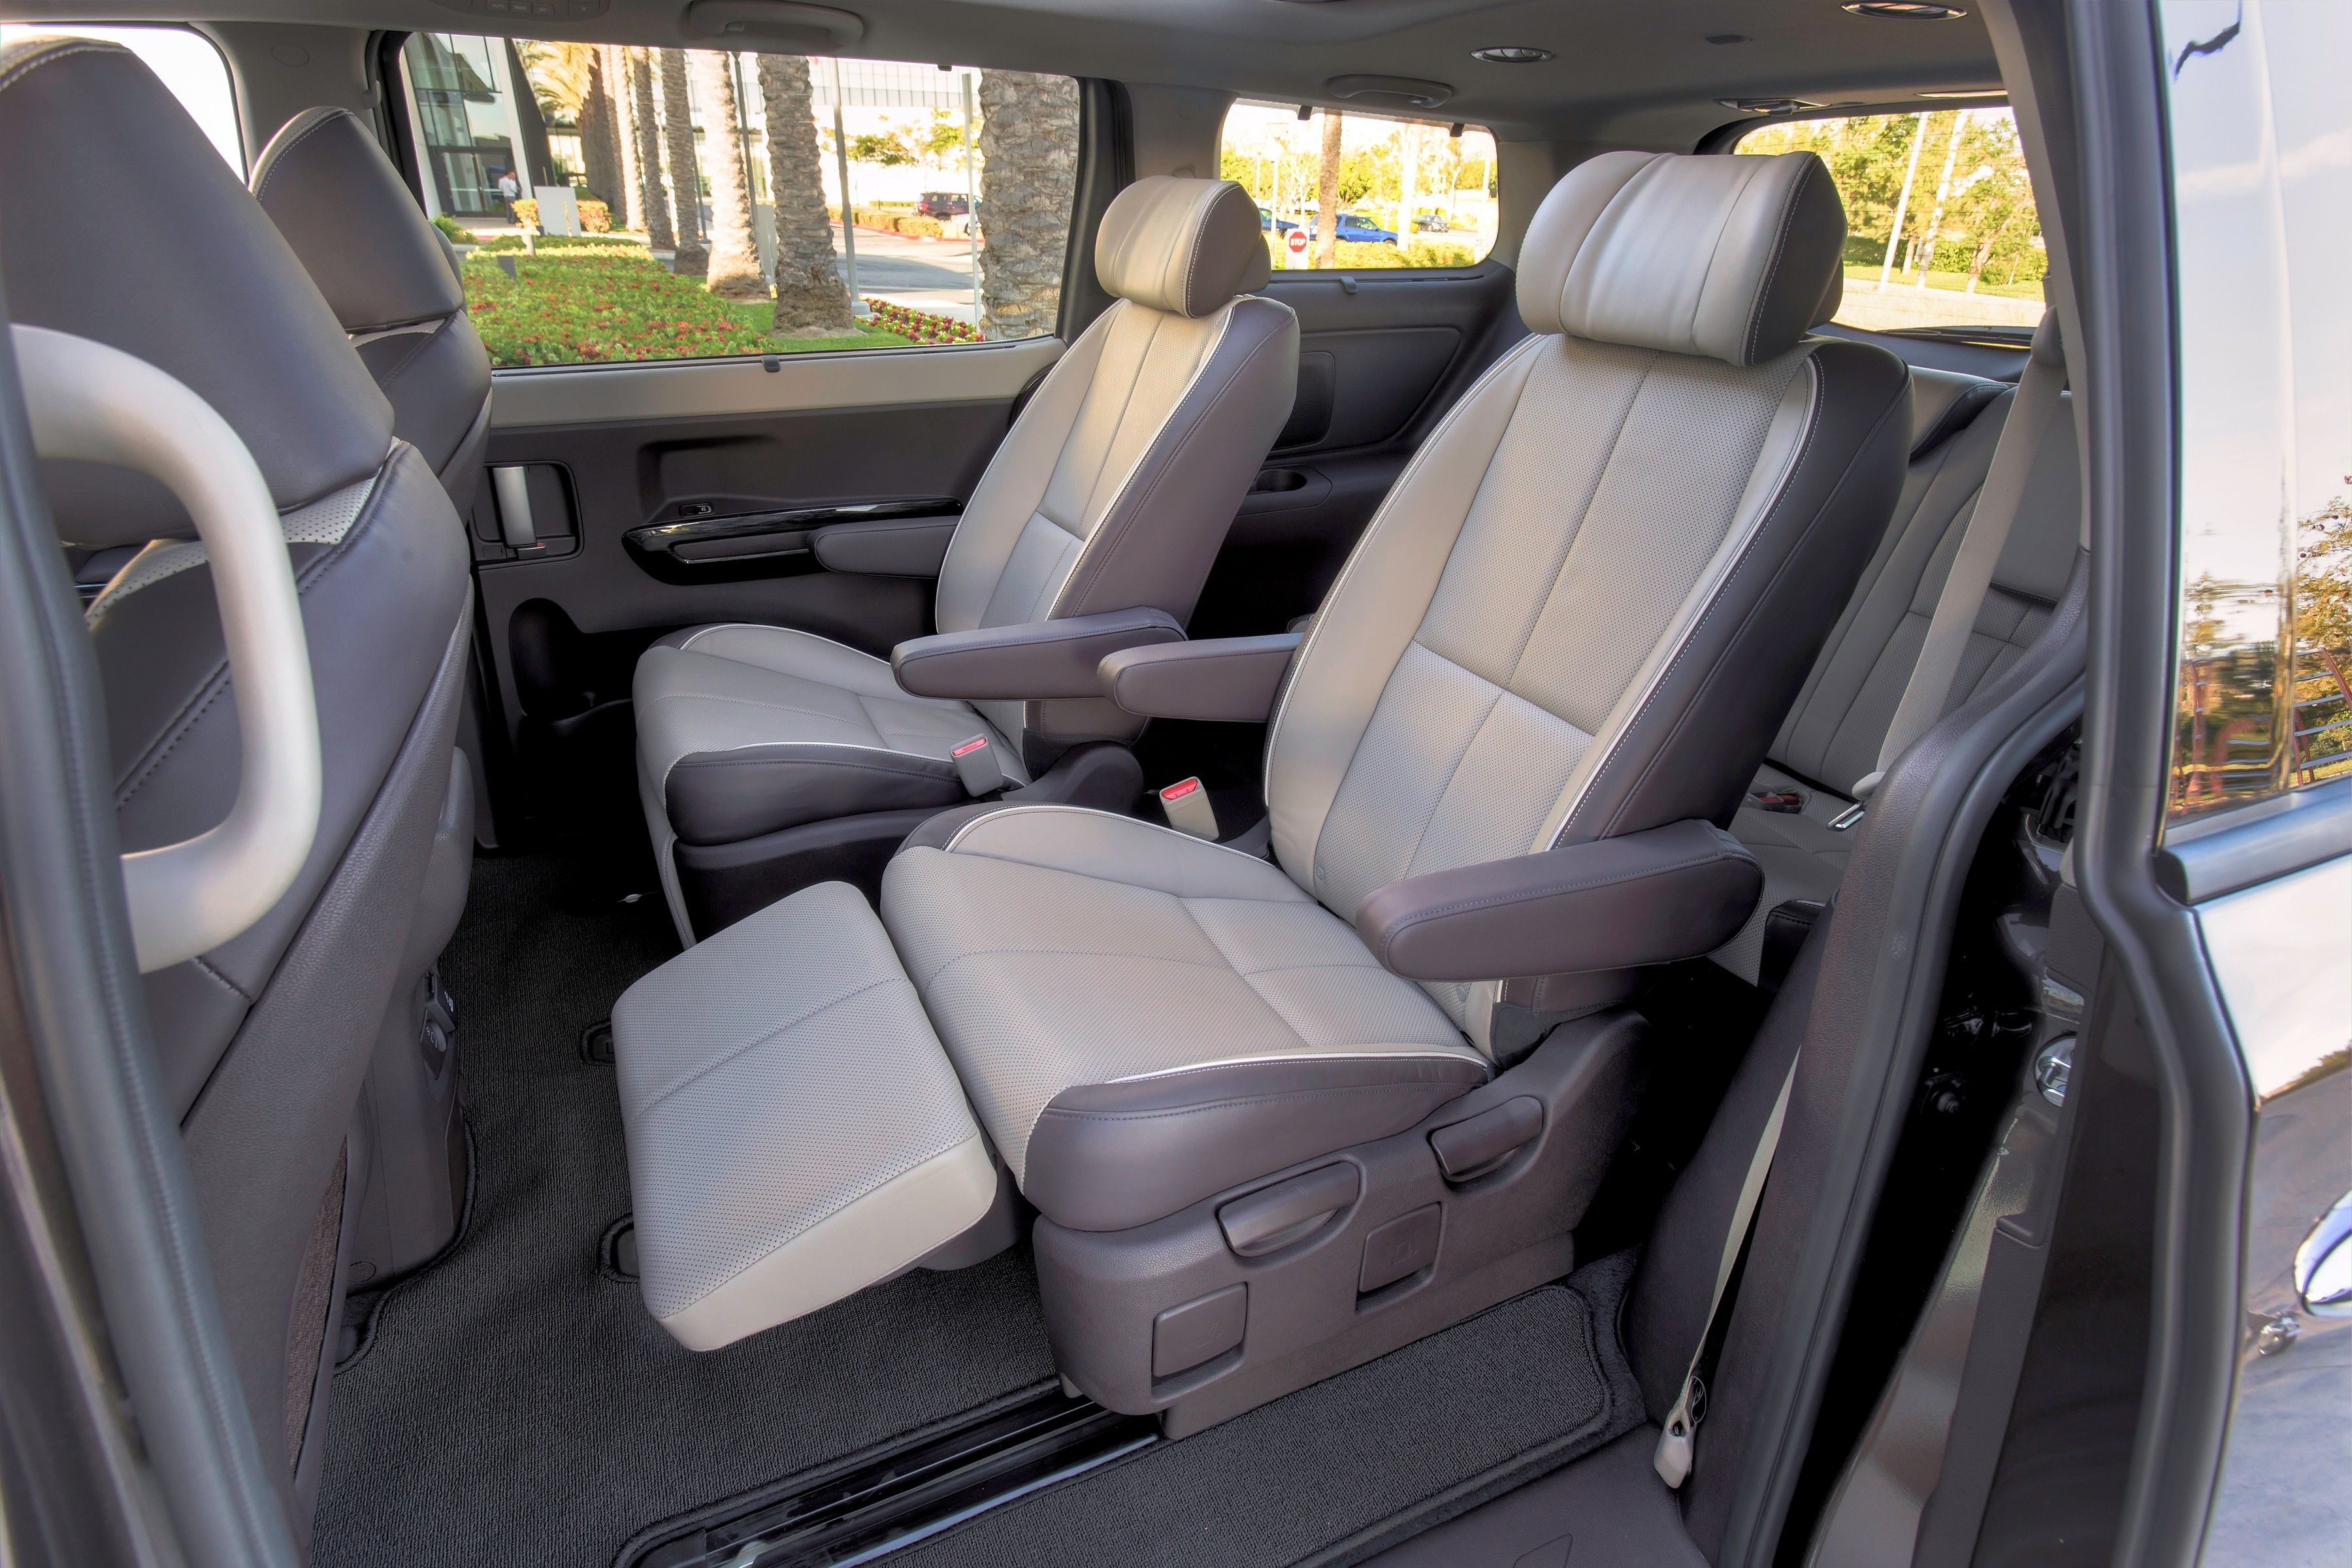 2015 kia sedona a multipurpose vehicle for people who hate minivans